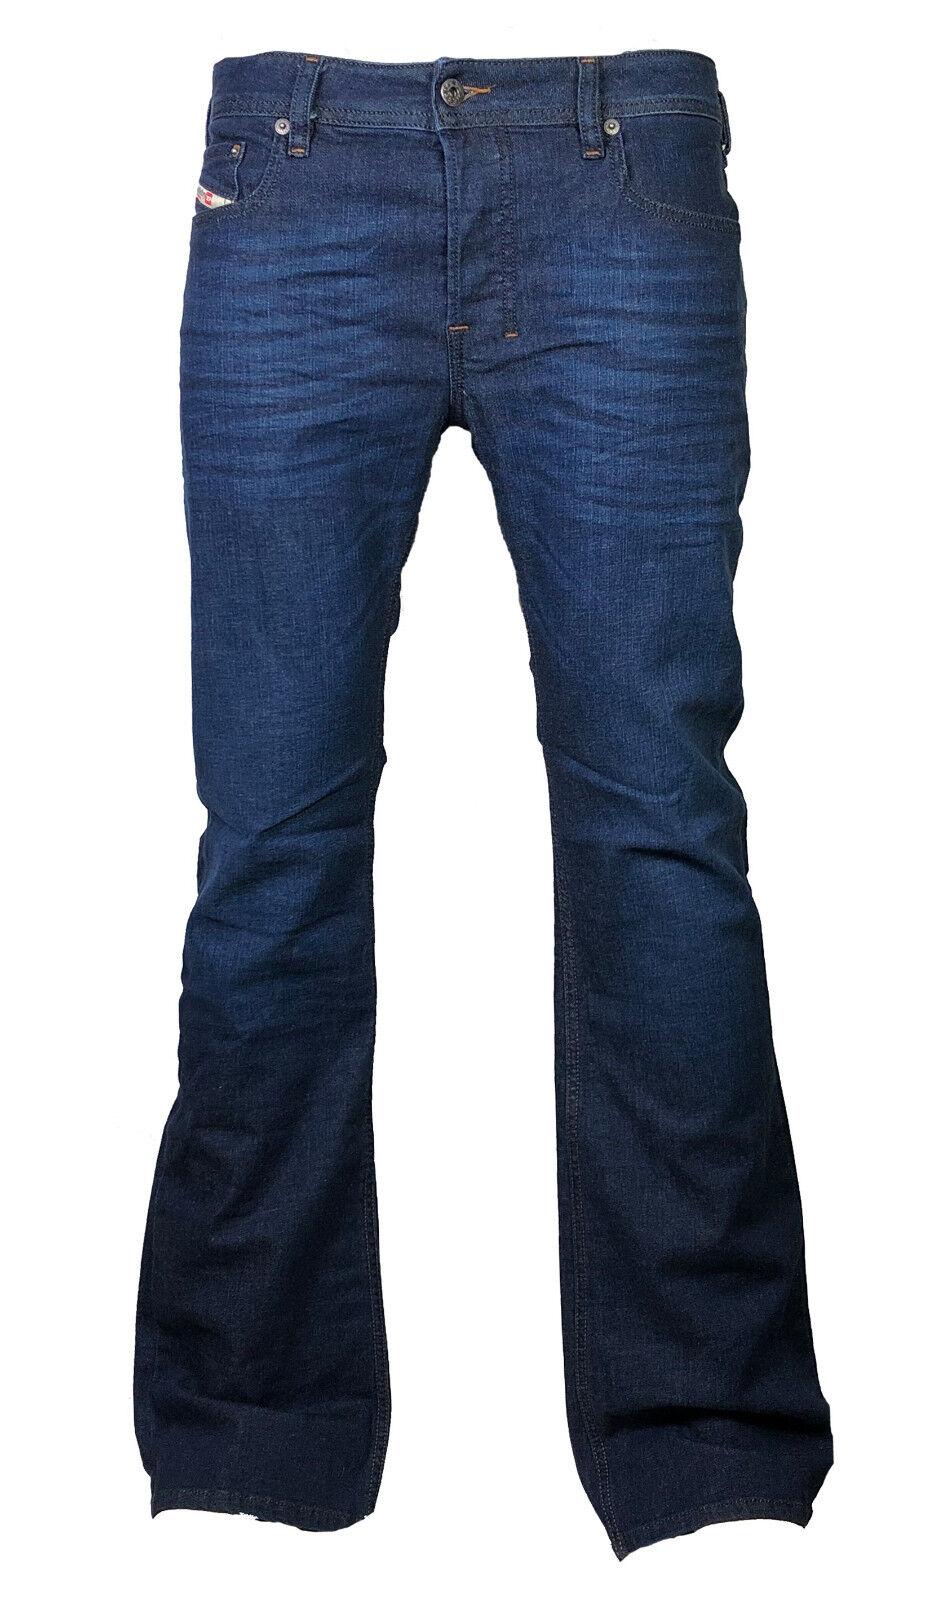 Diesel Hommes boot-cut boot-cut boot-cut jean stretch Zathan r845b bleu foncé 30/30 NEUF a11ca7